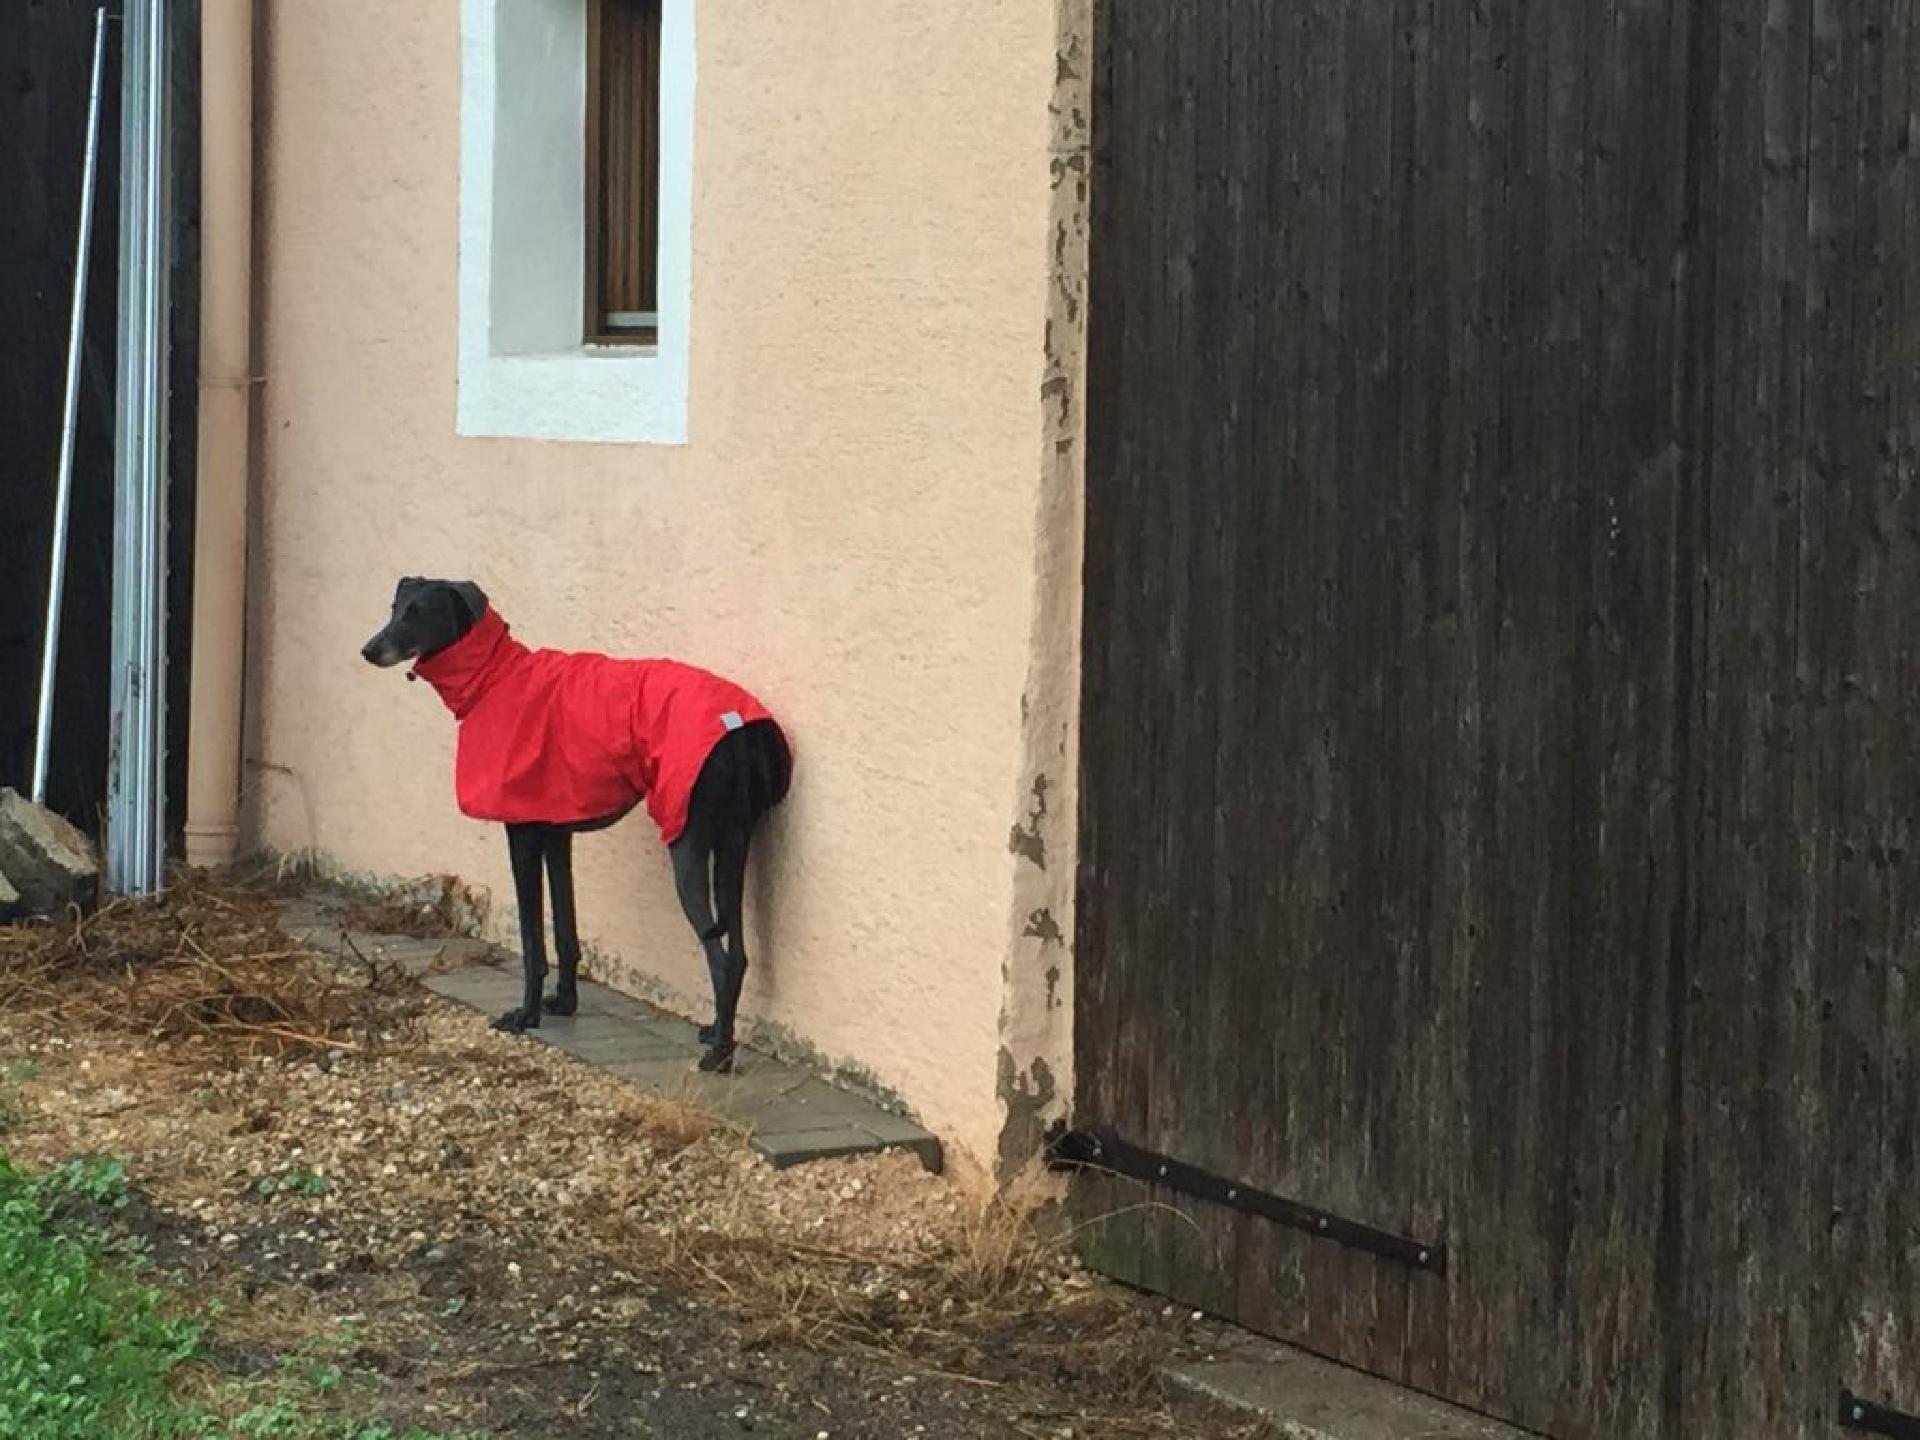 Manche Hunde schätzen Regen und Matsch